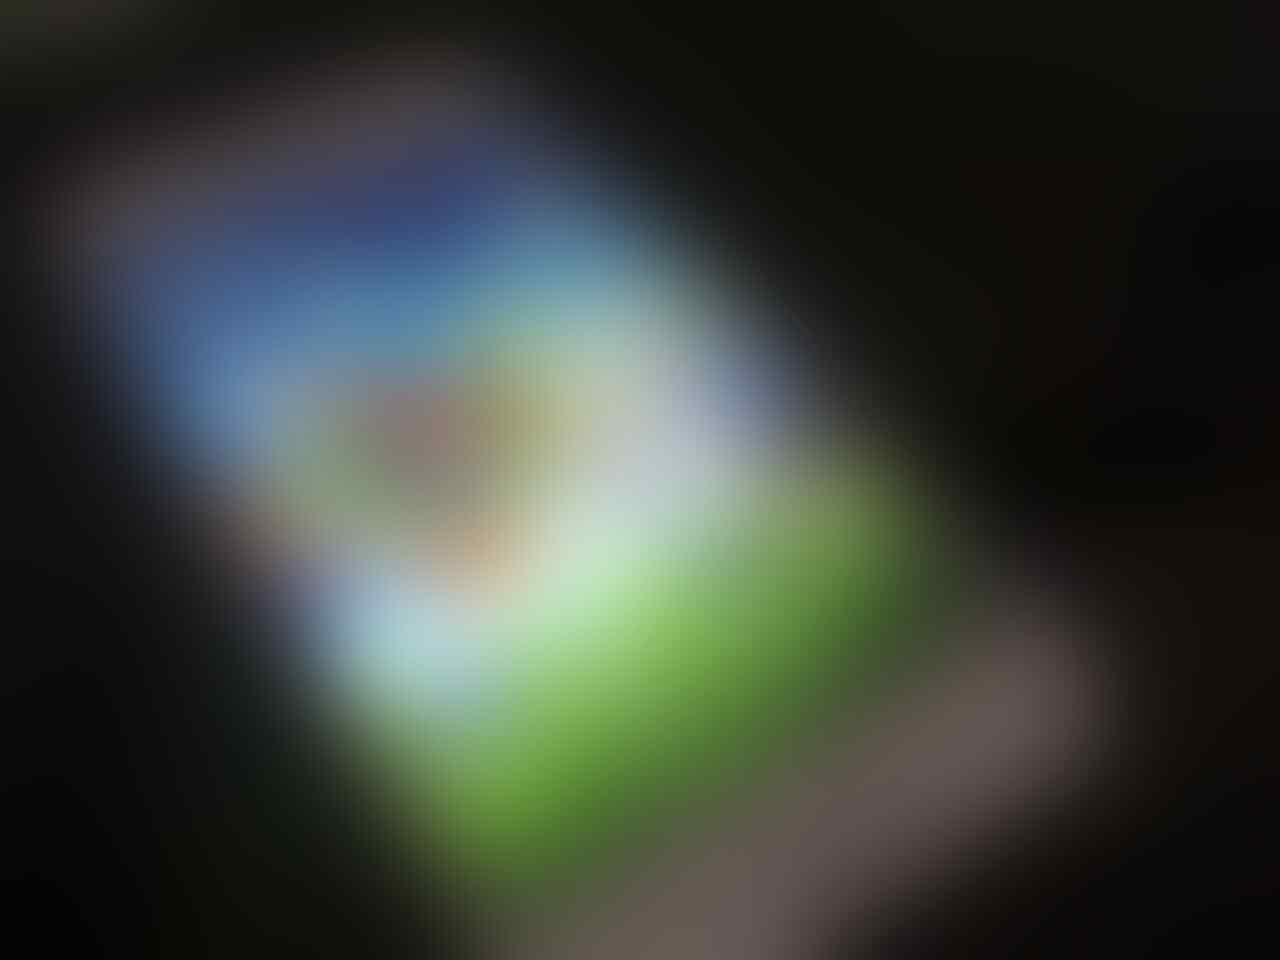 SAMSUNG S4 REPLIKA MULUS LIKE NEW+ANTI GORES